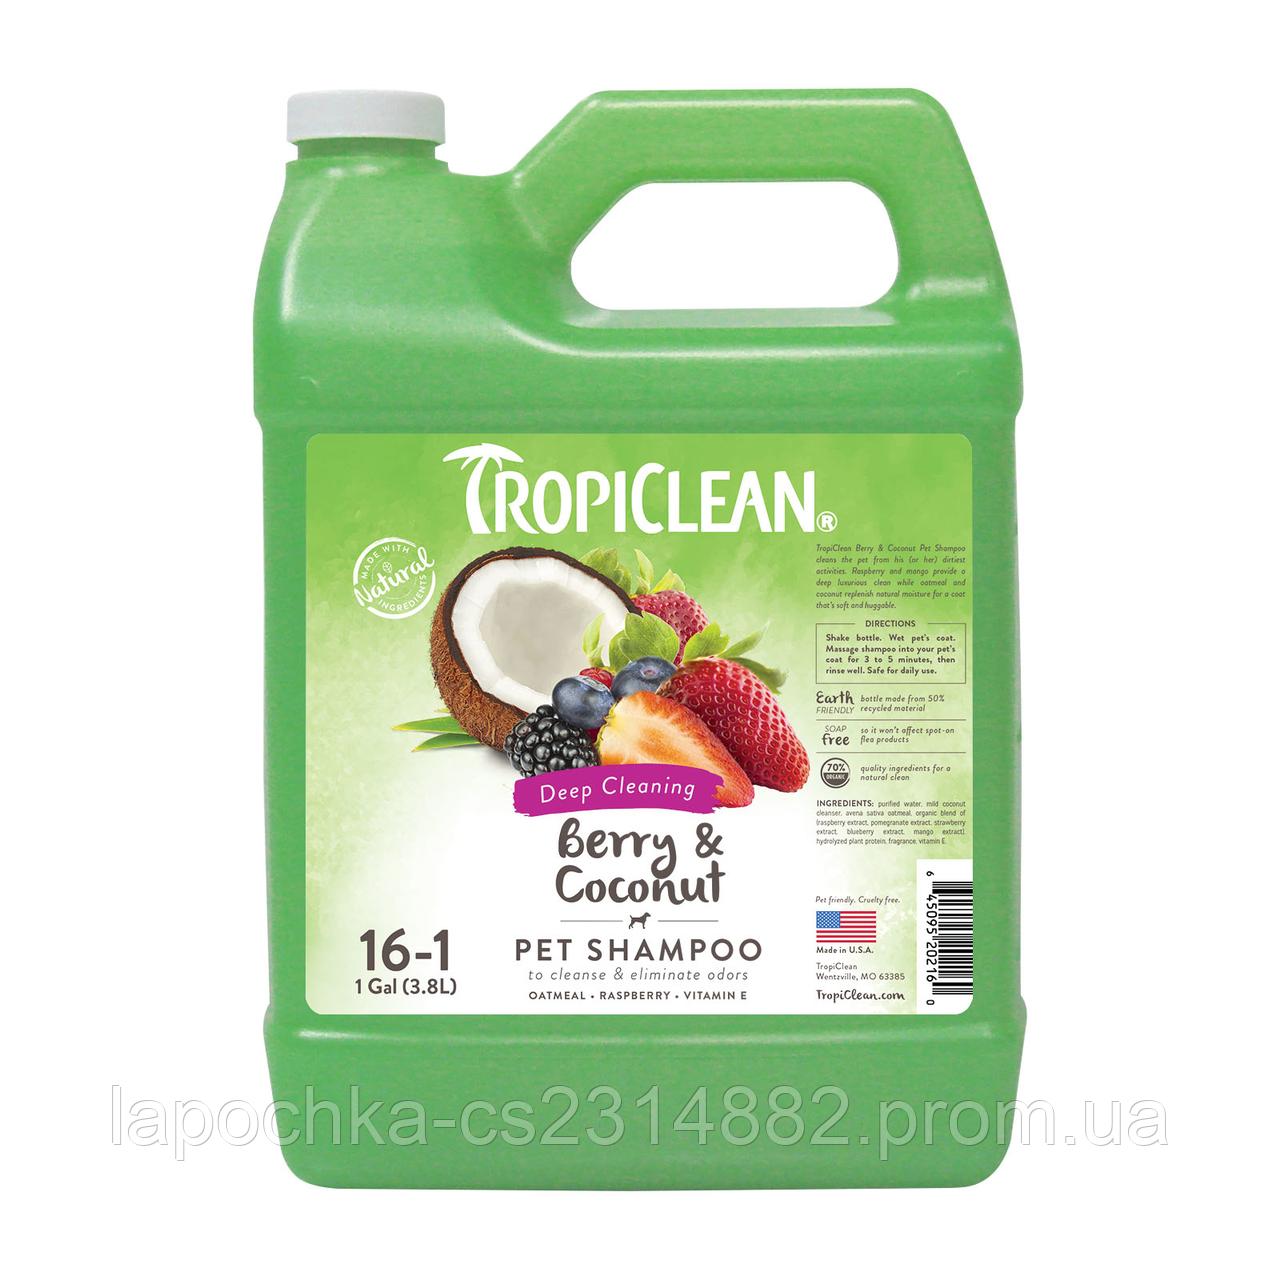 Шампунь TropiClean Berry & Coconut очищаючий, ягода/кокос, 3,8 л